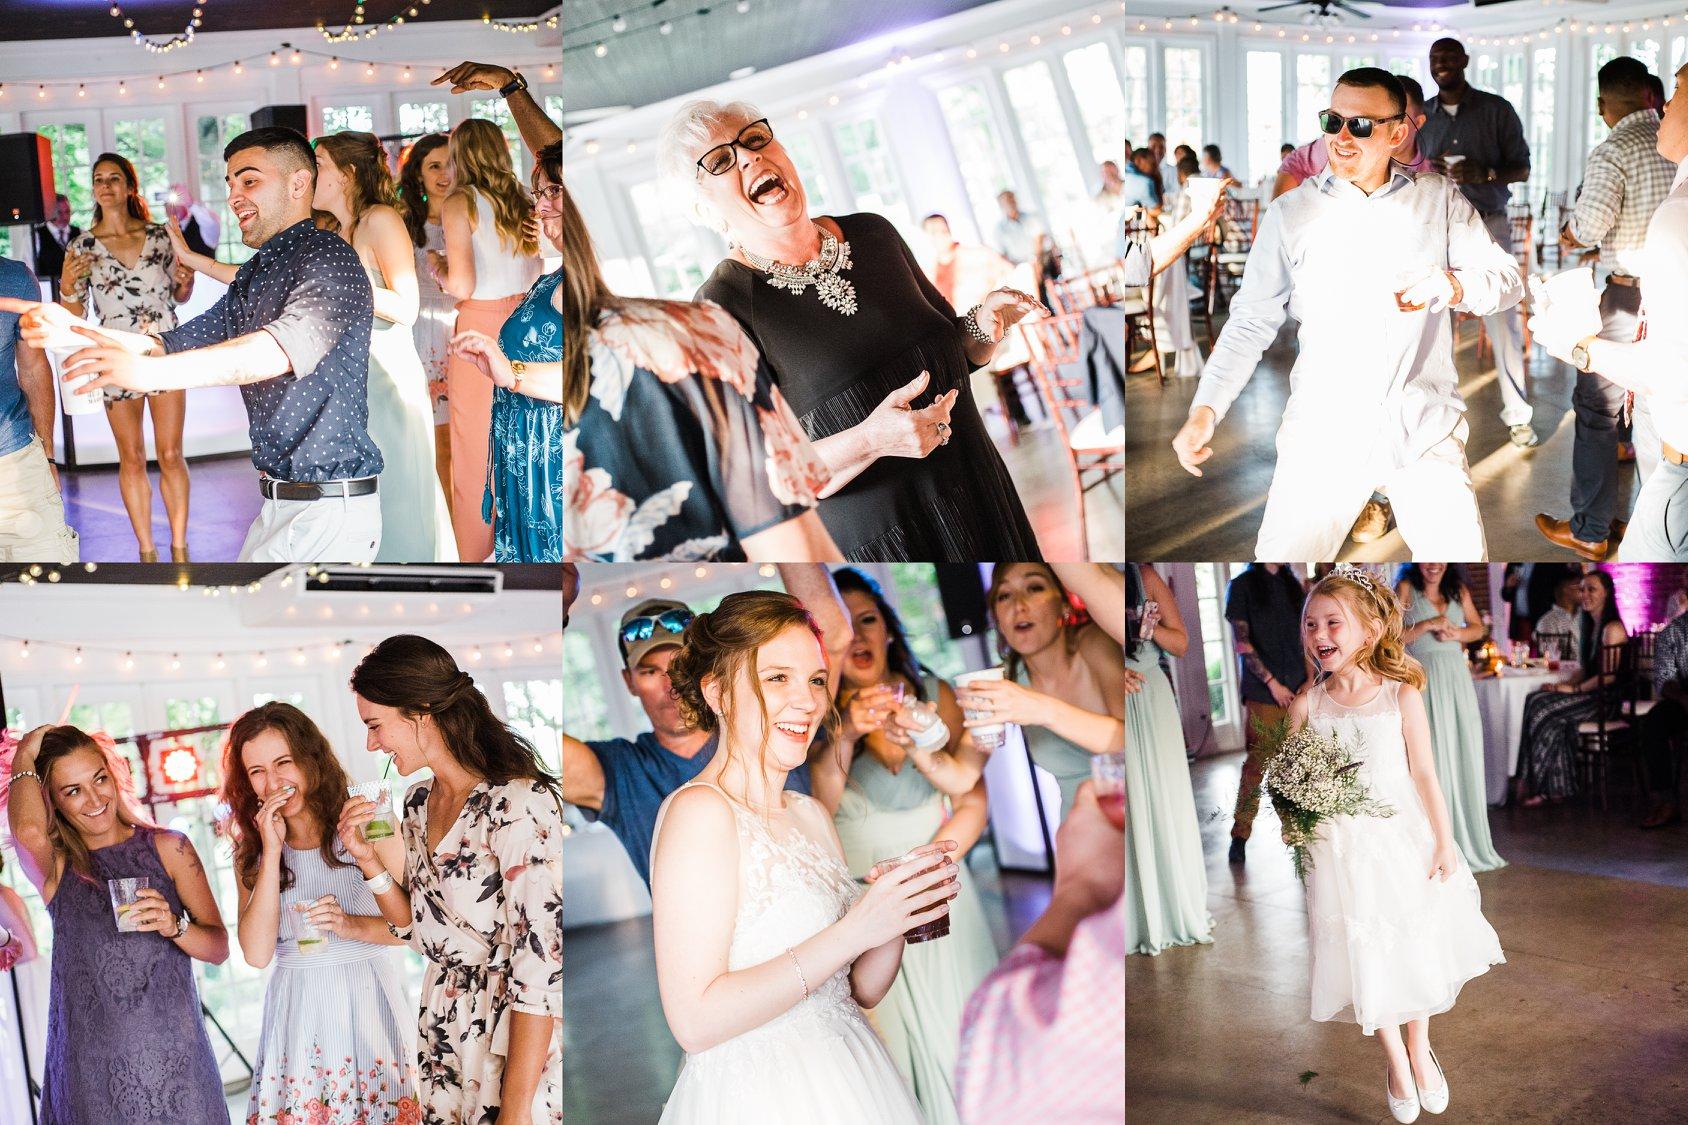 Wedding DJ Services in Fredrick MD